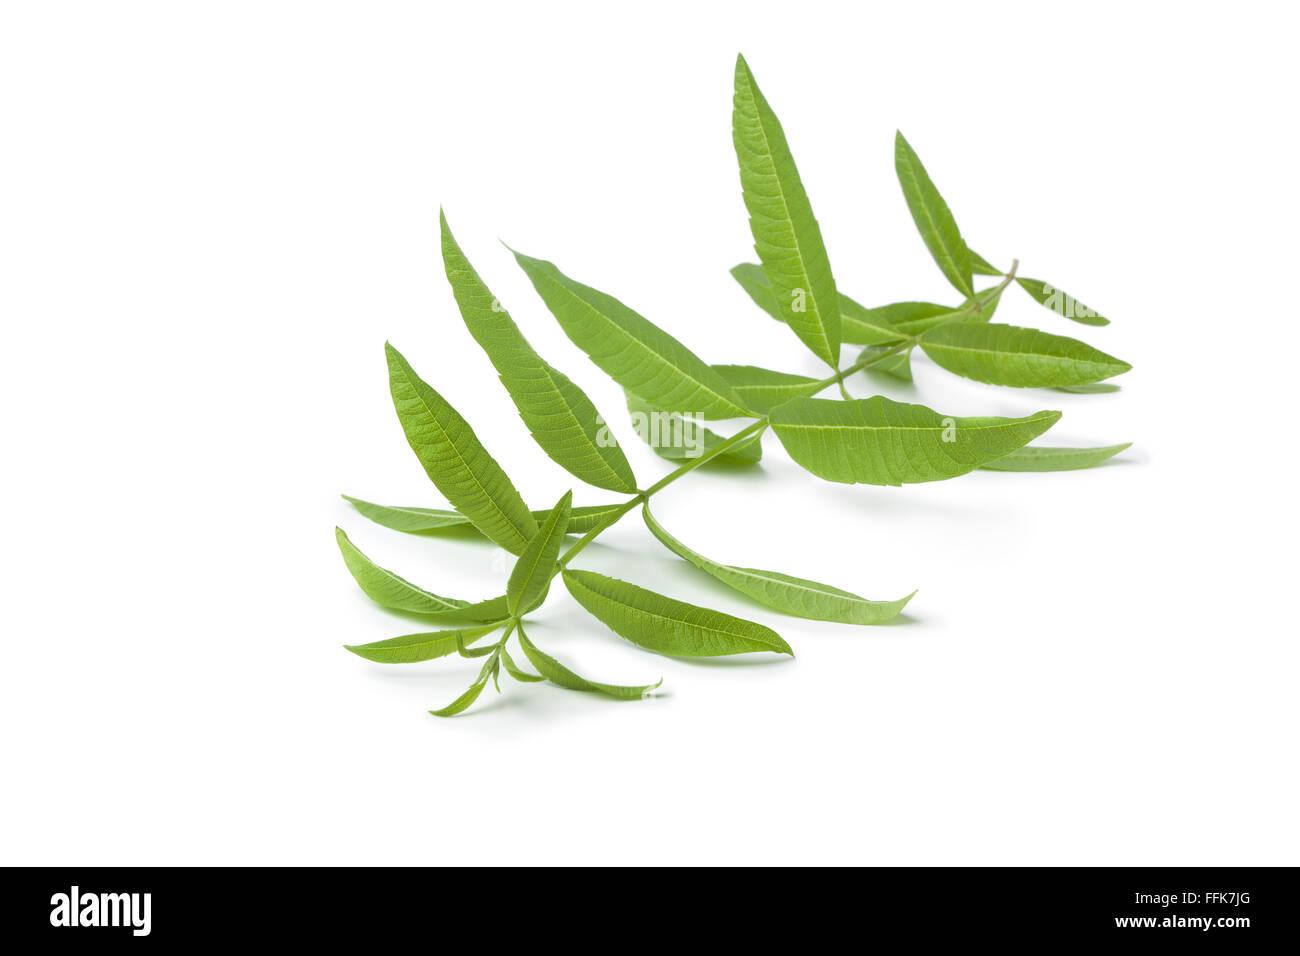 Twig of fresh verveine on white background - Stock Image